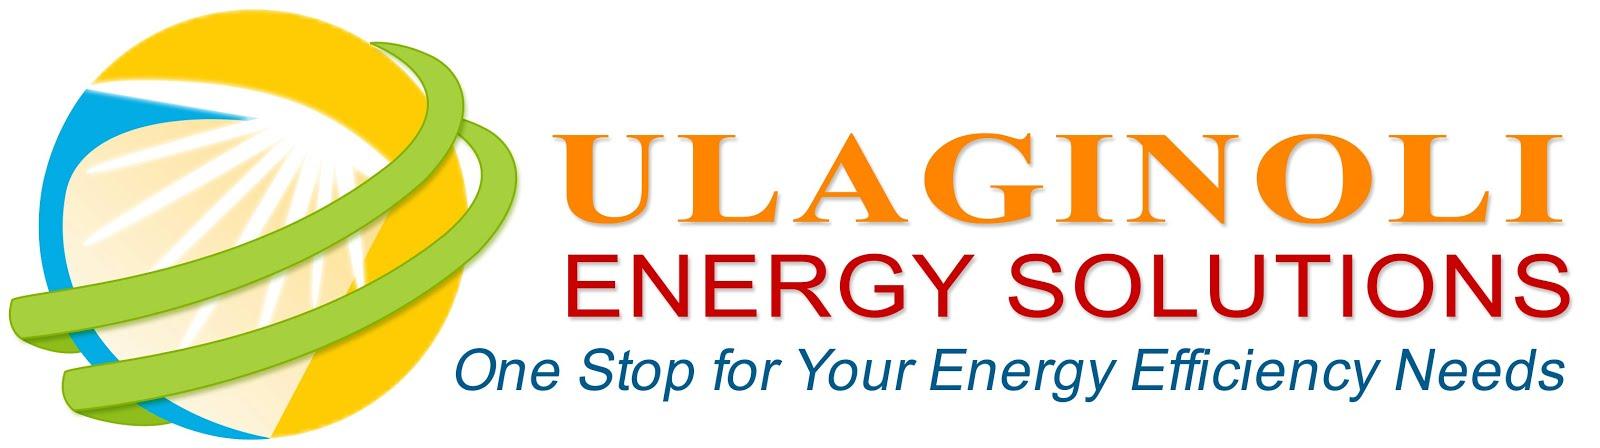 ULAGINOLI ENERGY SOLUTIONS PVT. LTD.